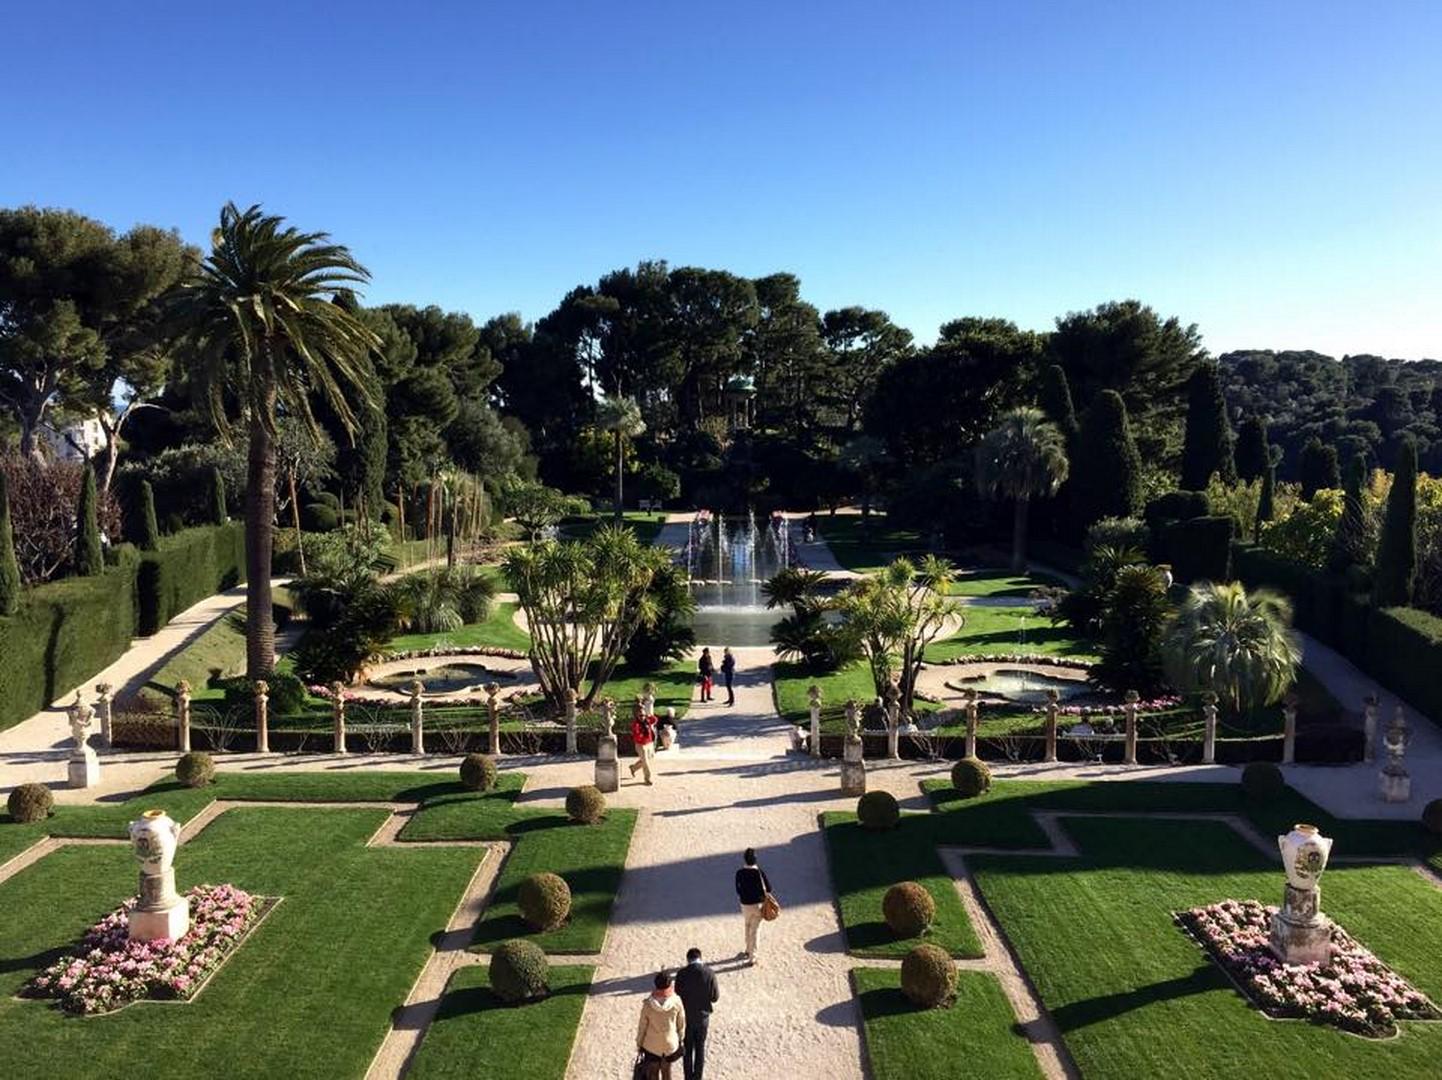 La villa Ephrussi de Rothschild (St Jean Cap Ferrat) 2